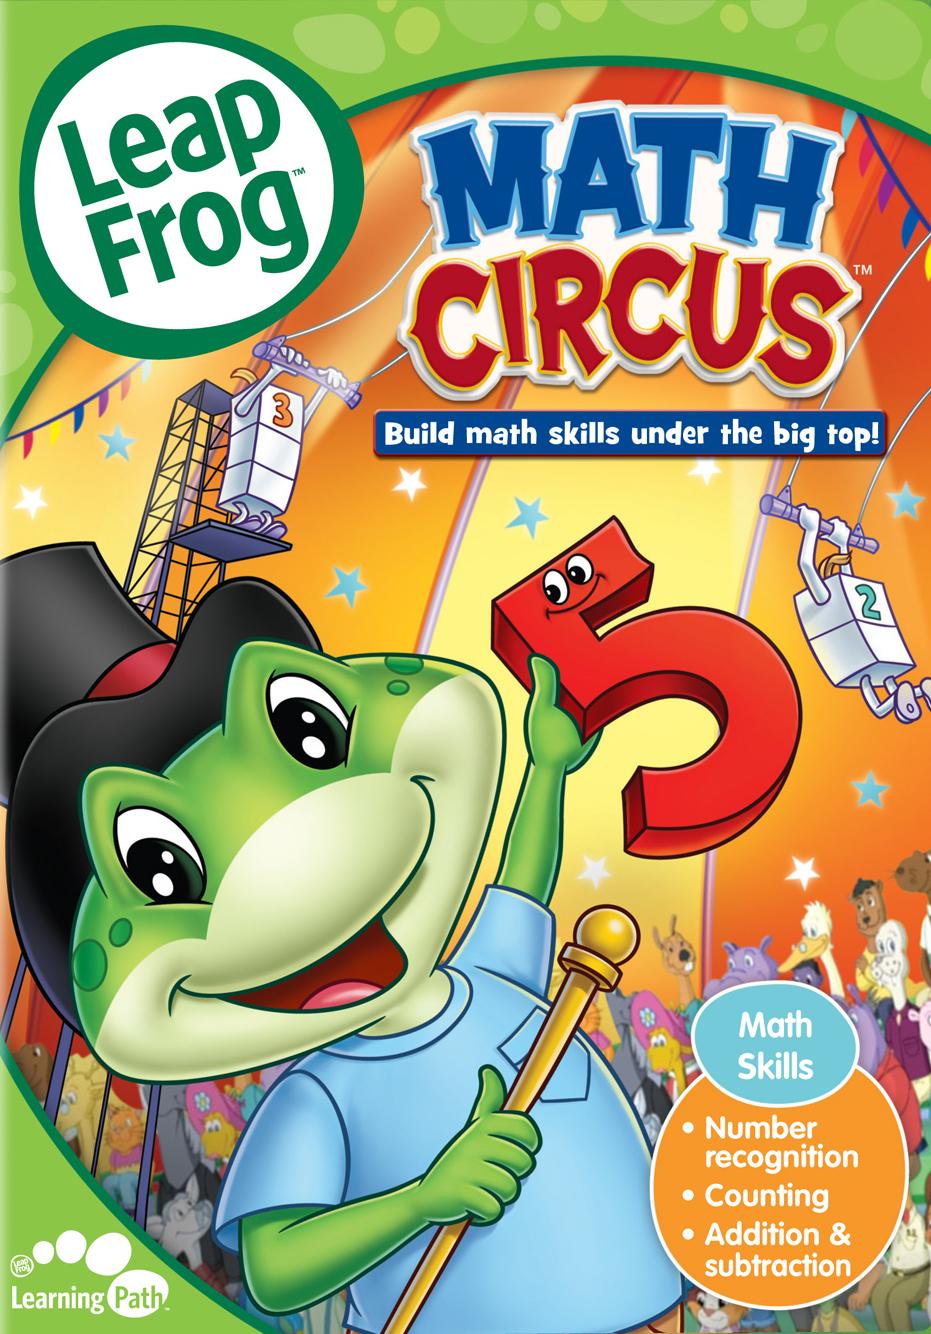 LeapFrog: Math Circus